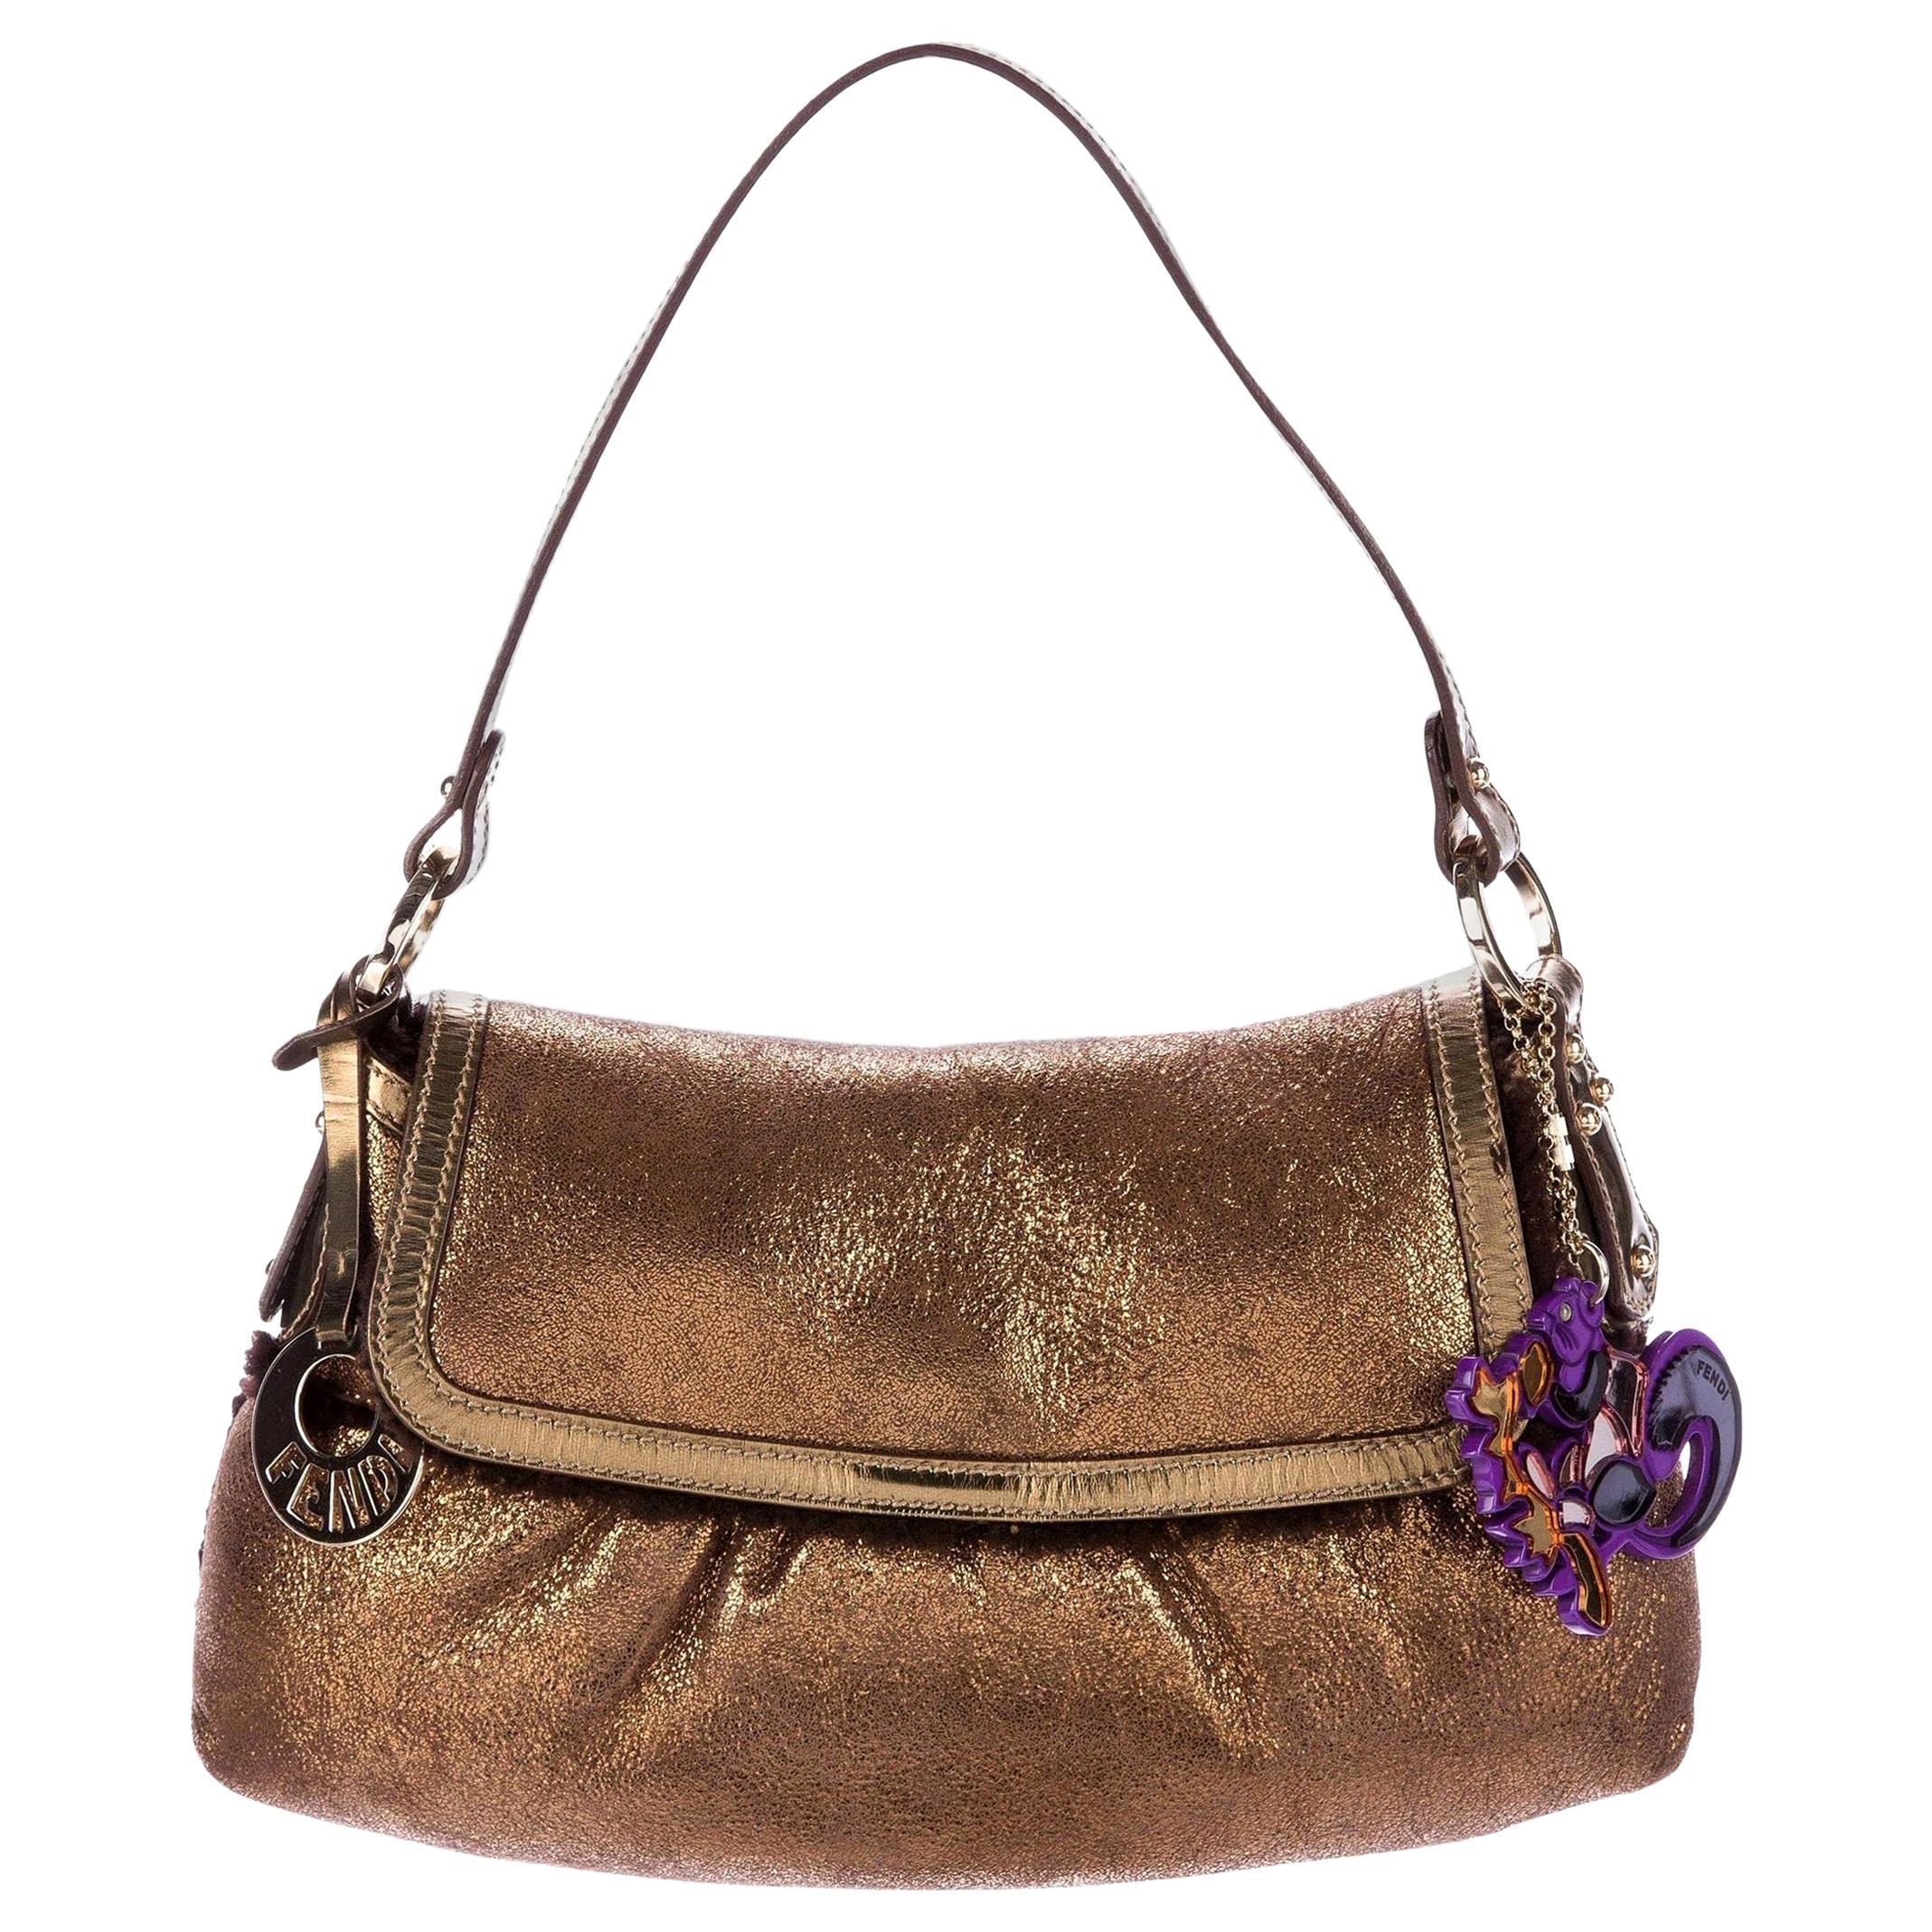 New Fendi Shearling Bronze Baguette Bag With Fendi Squirrel Purse Charm